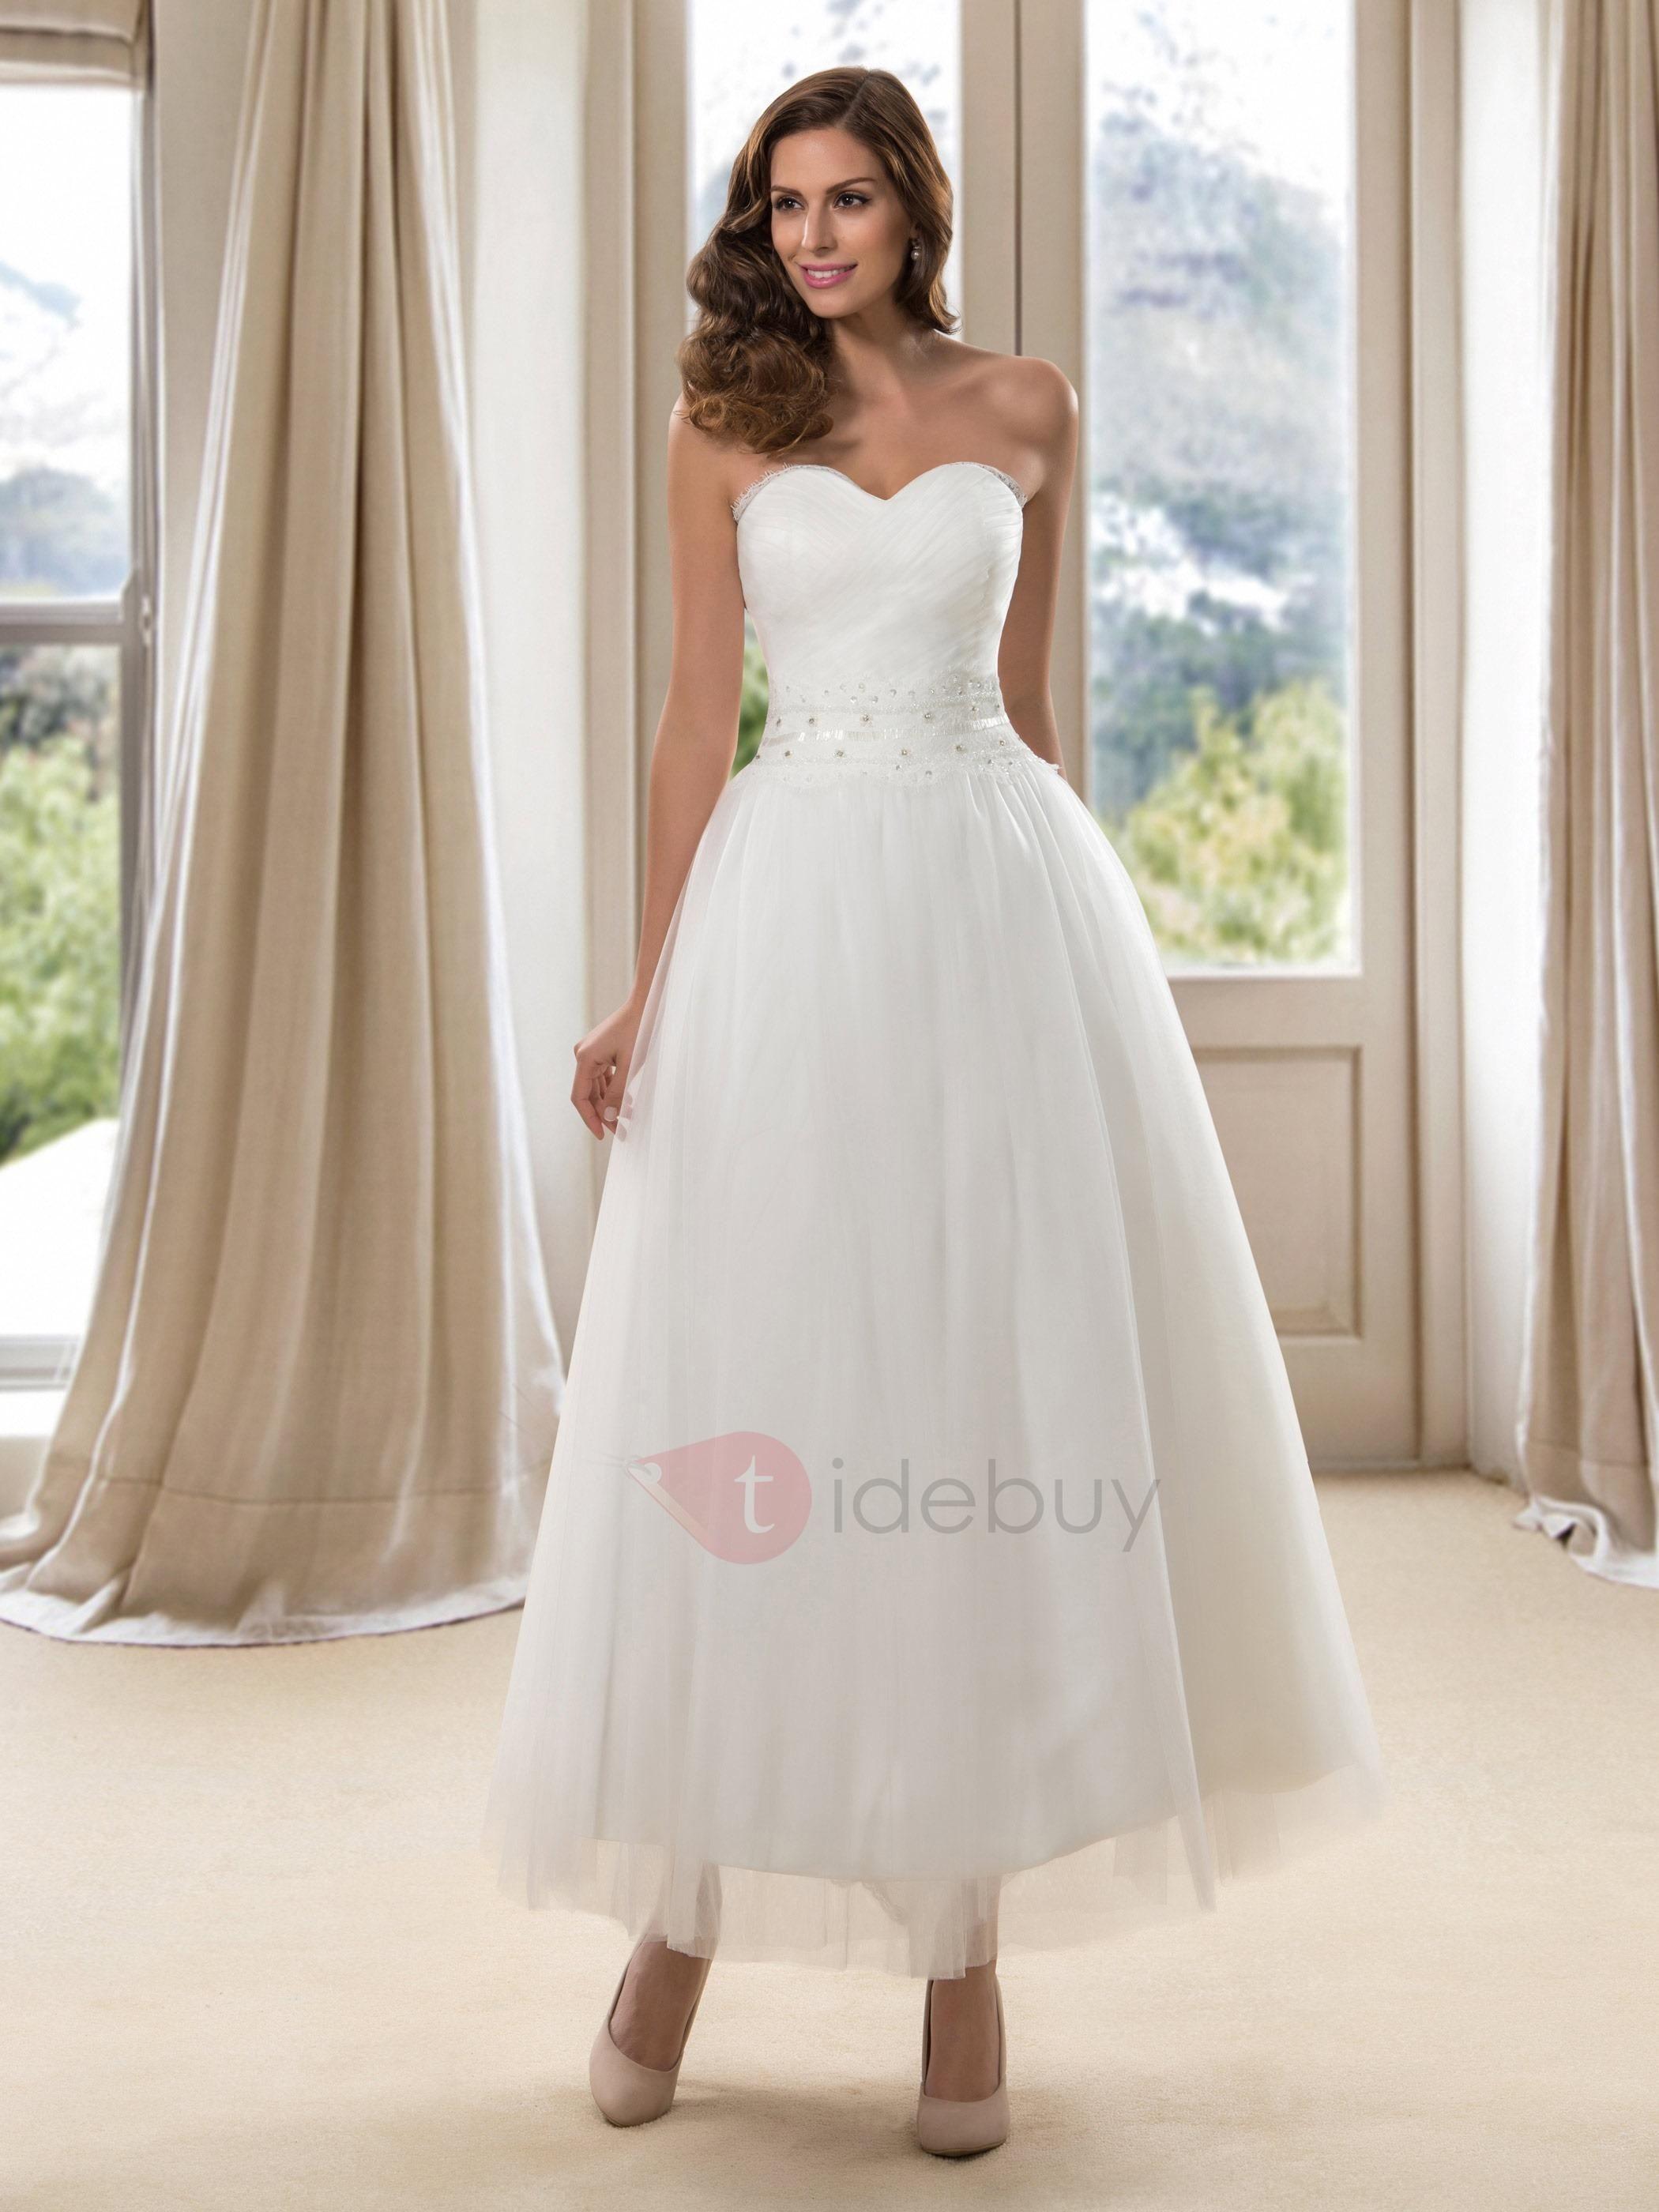 Tidebuy Wedding Dresses